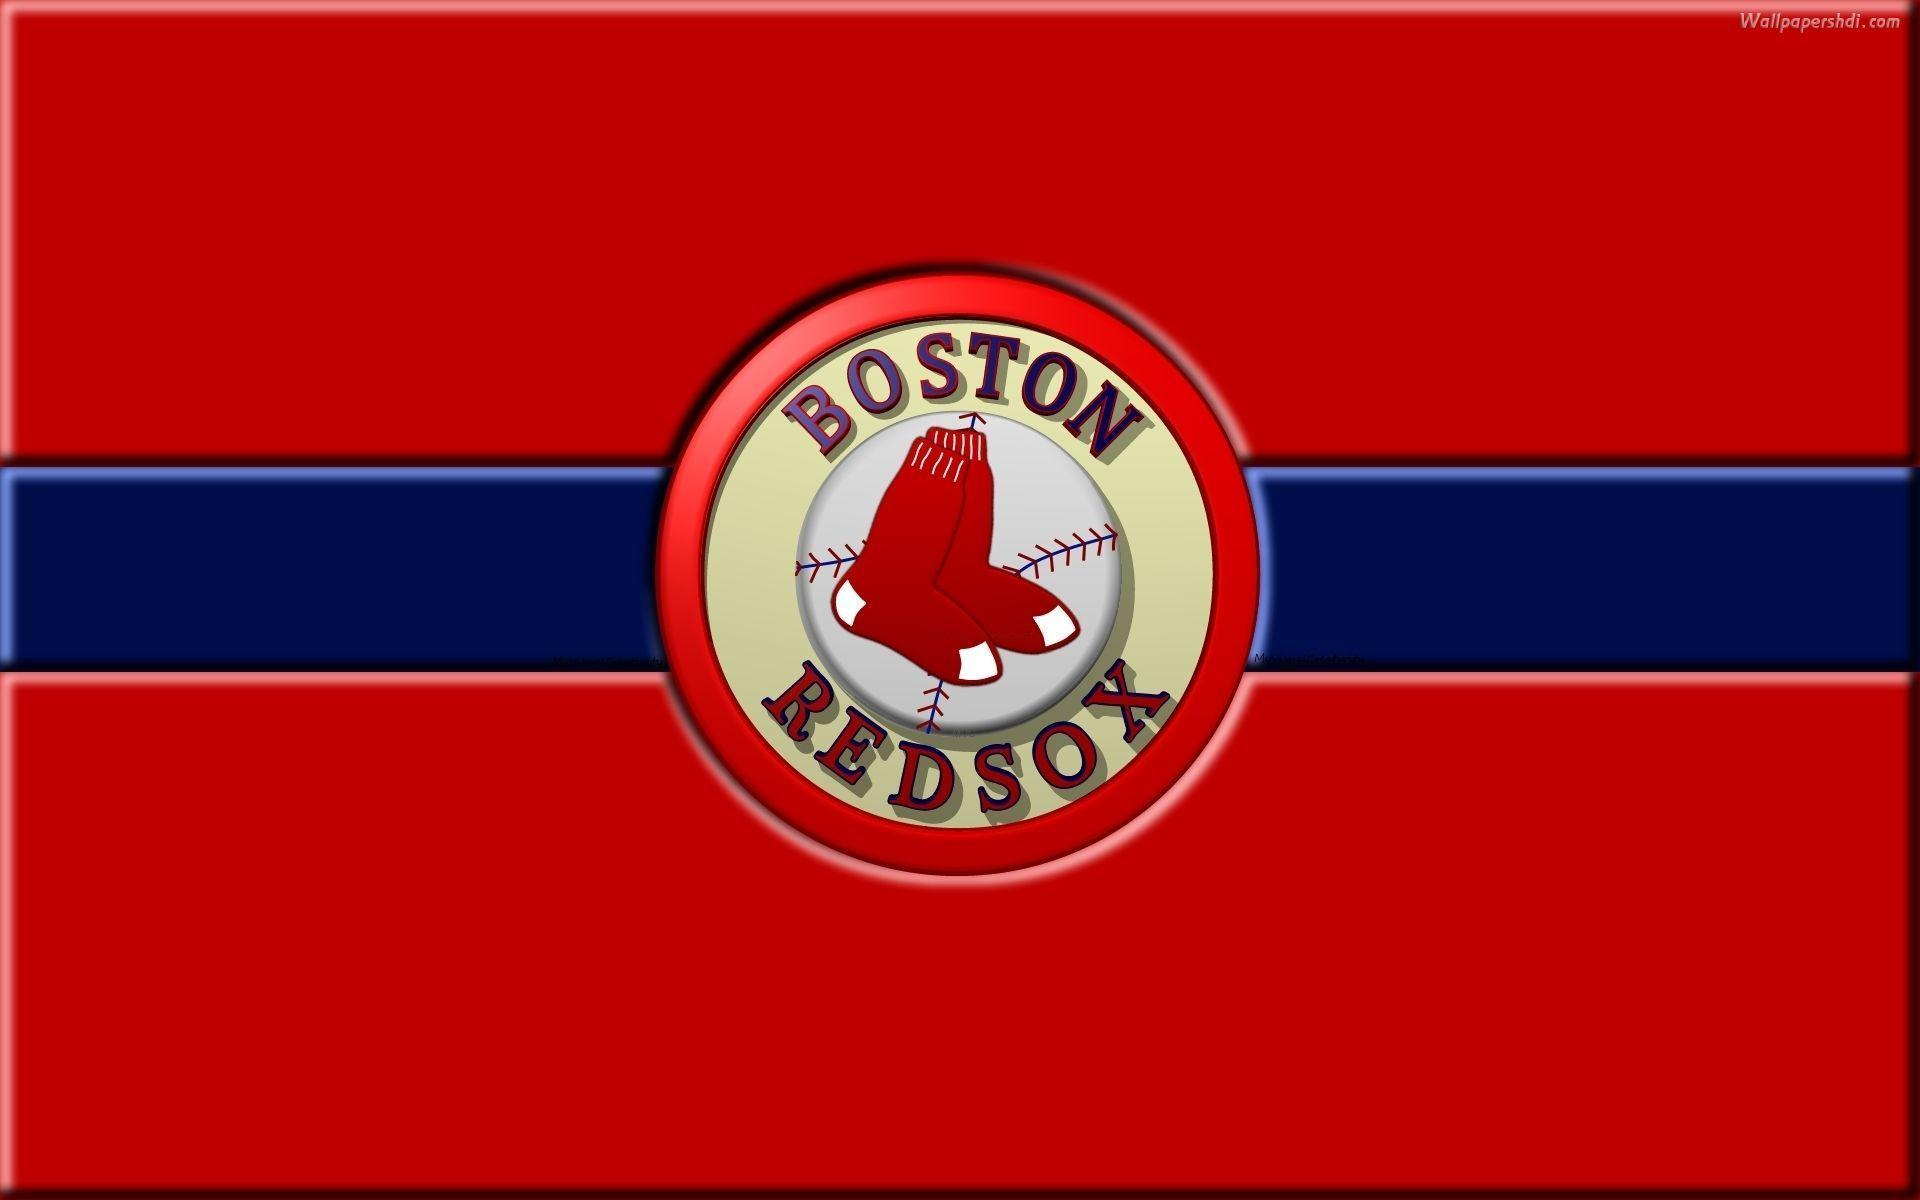 boston celtics logo wallpaper hd